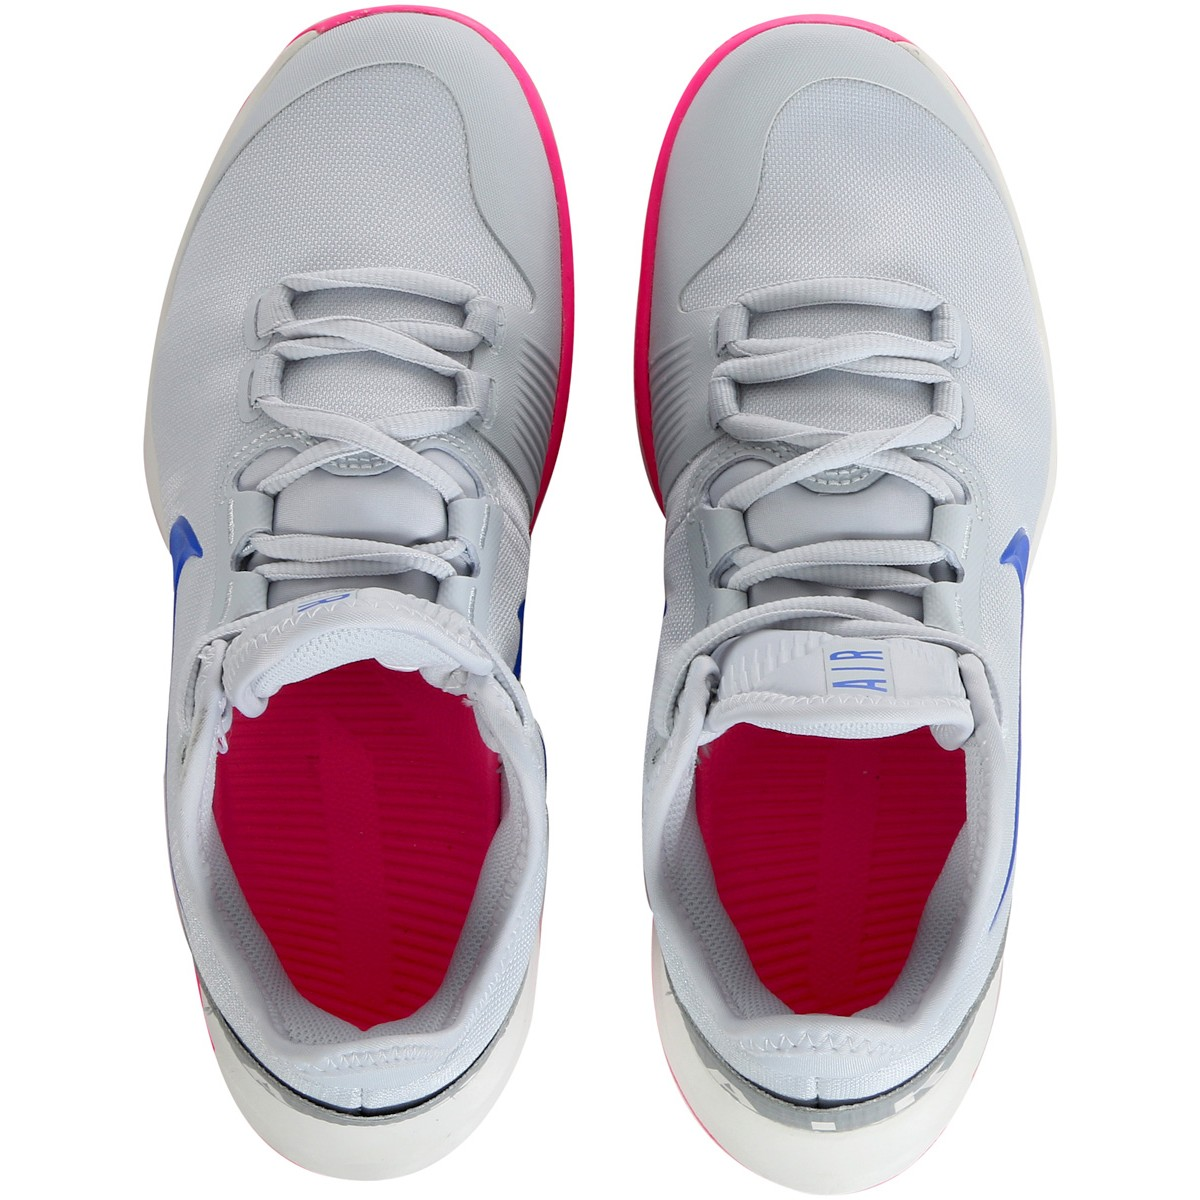 Wildcard Air Nike Court Max Chaussures Terre Battue OPiuTwXZlk